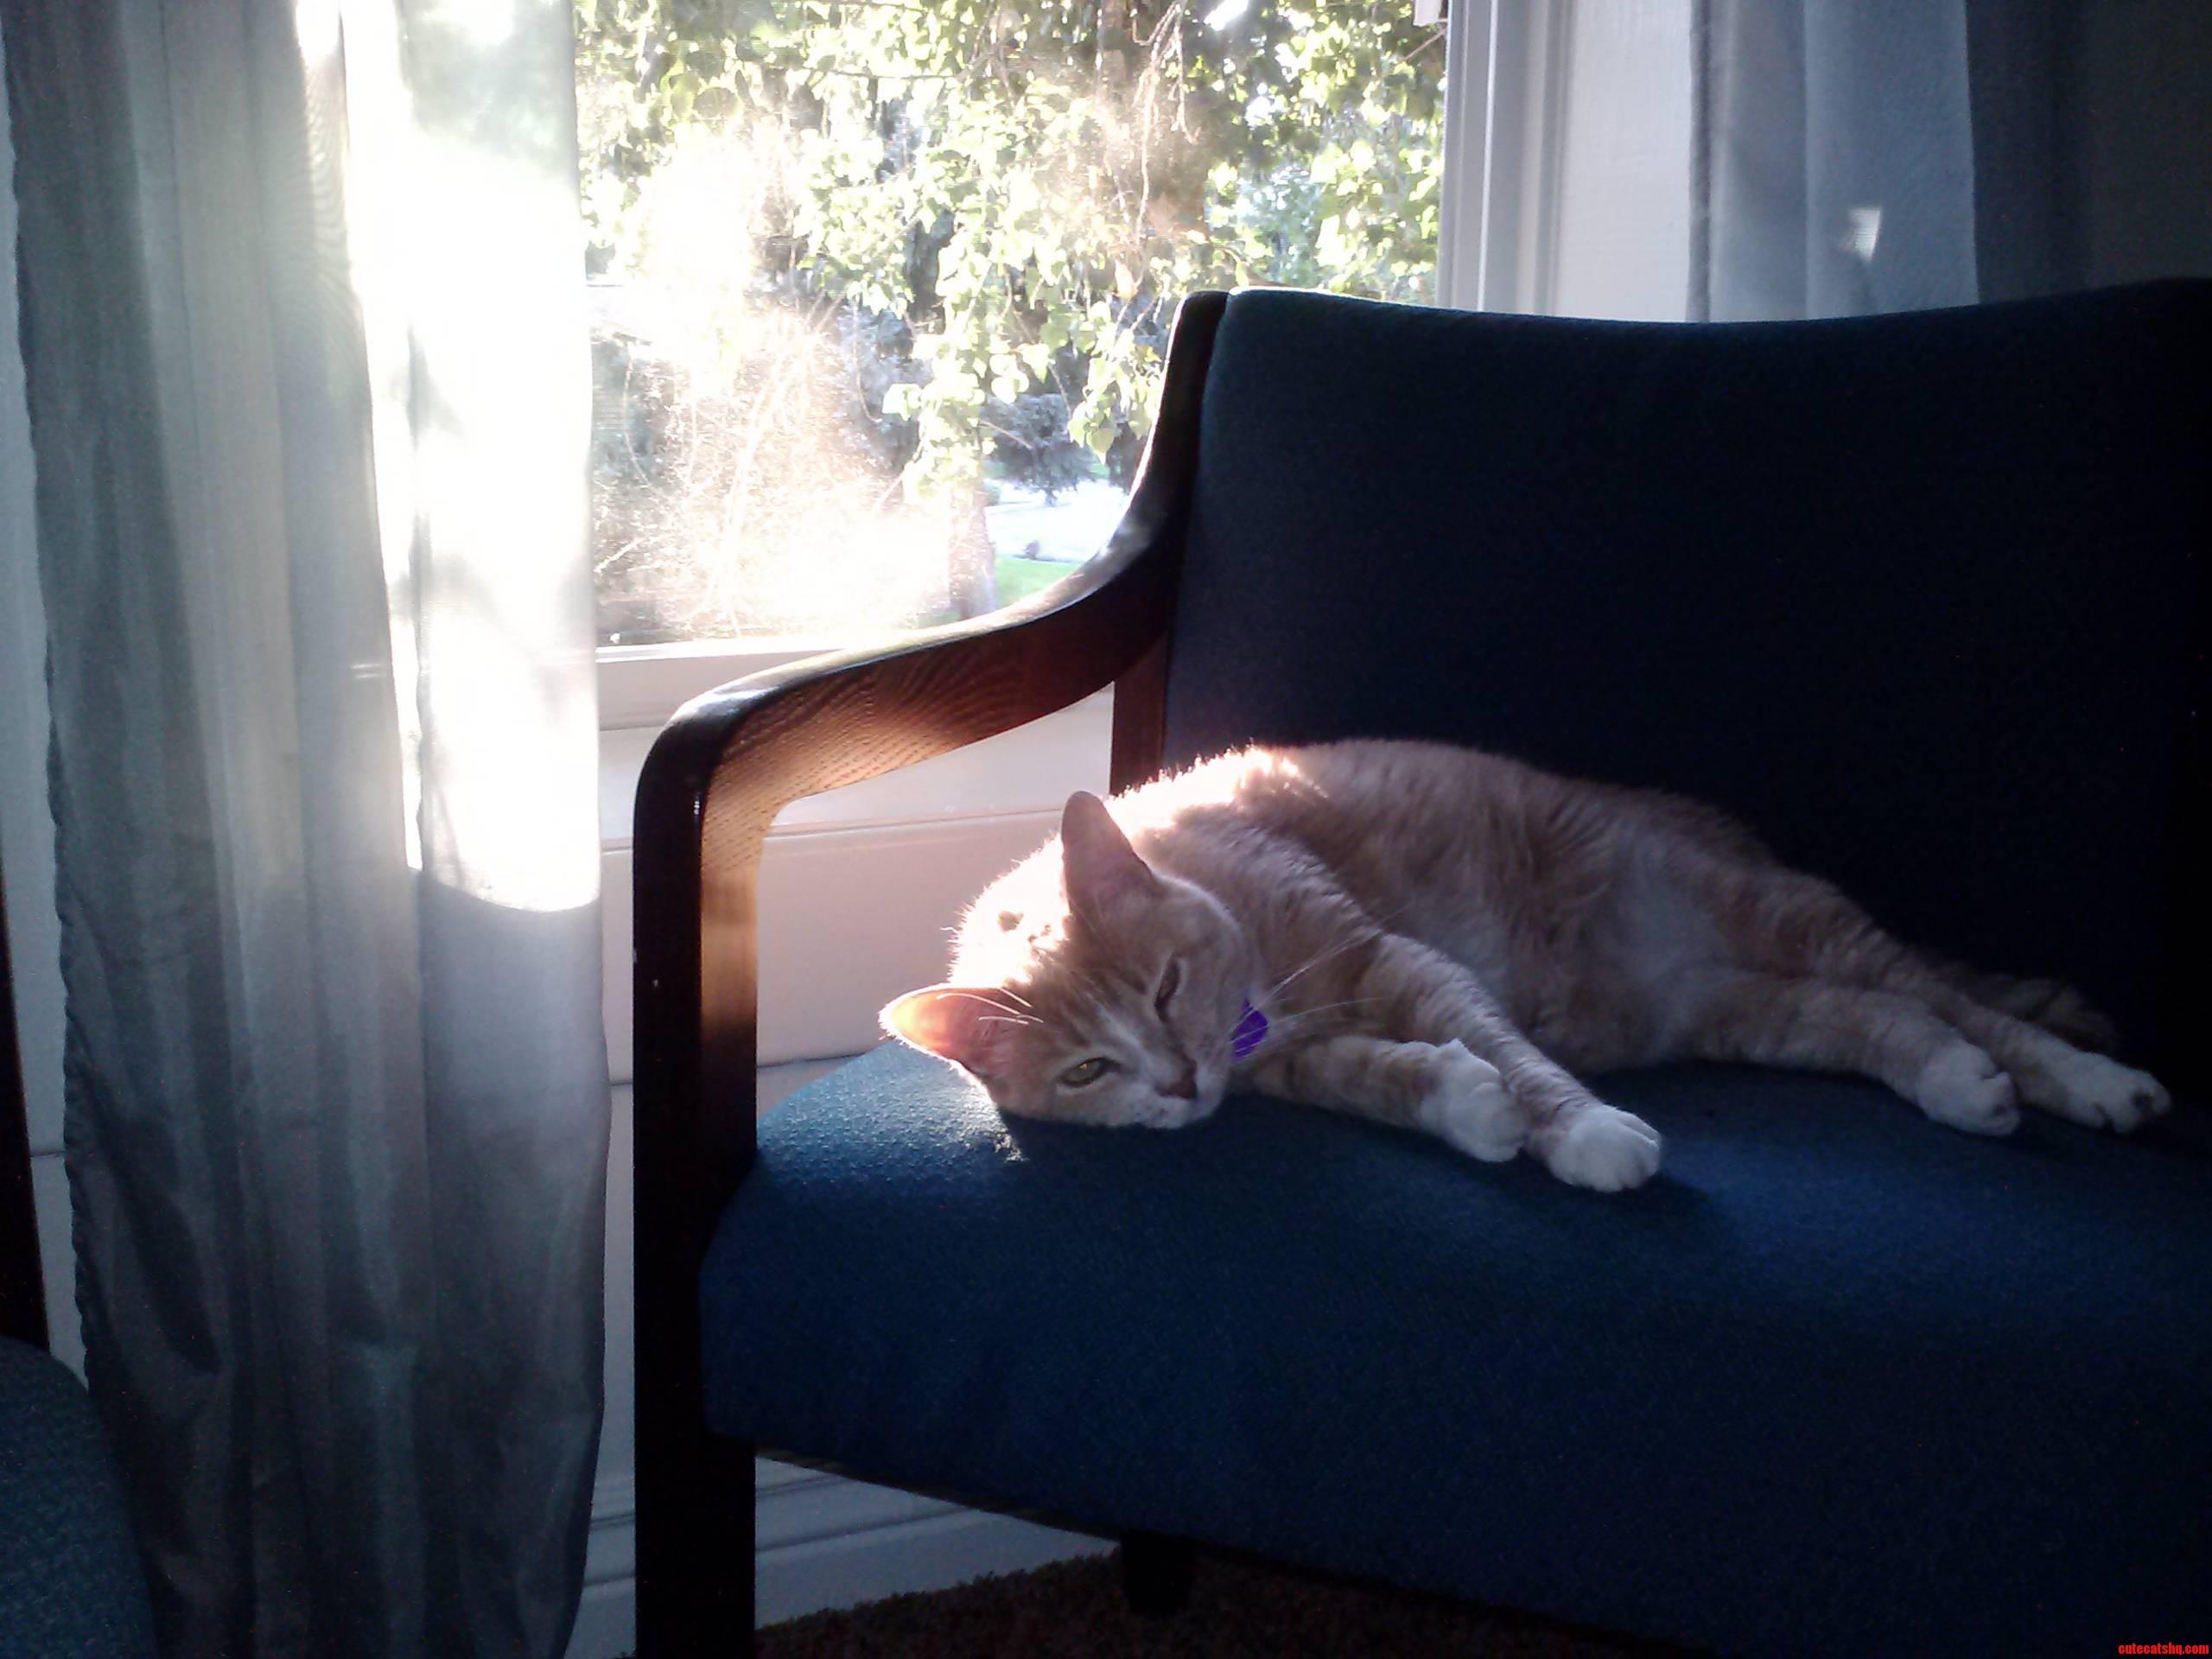 Reddit Heres My Cat Sun Bathing